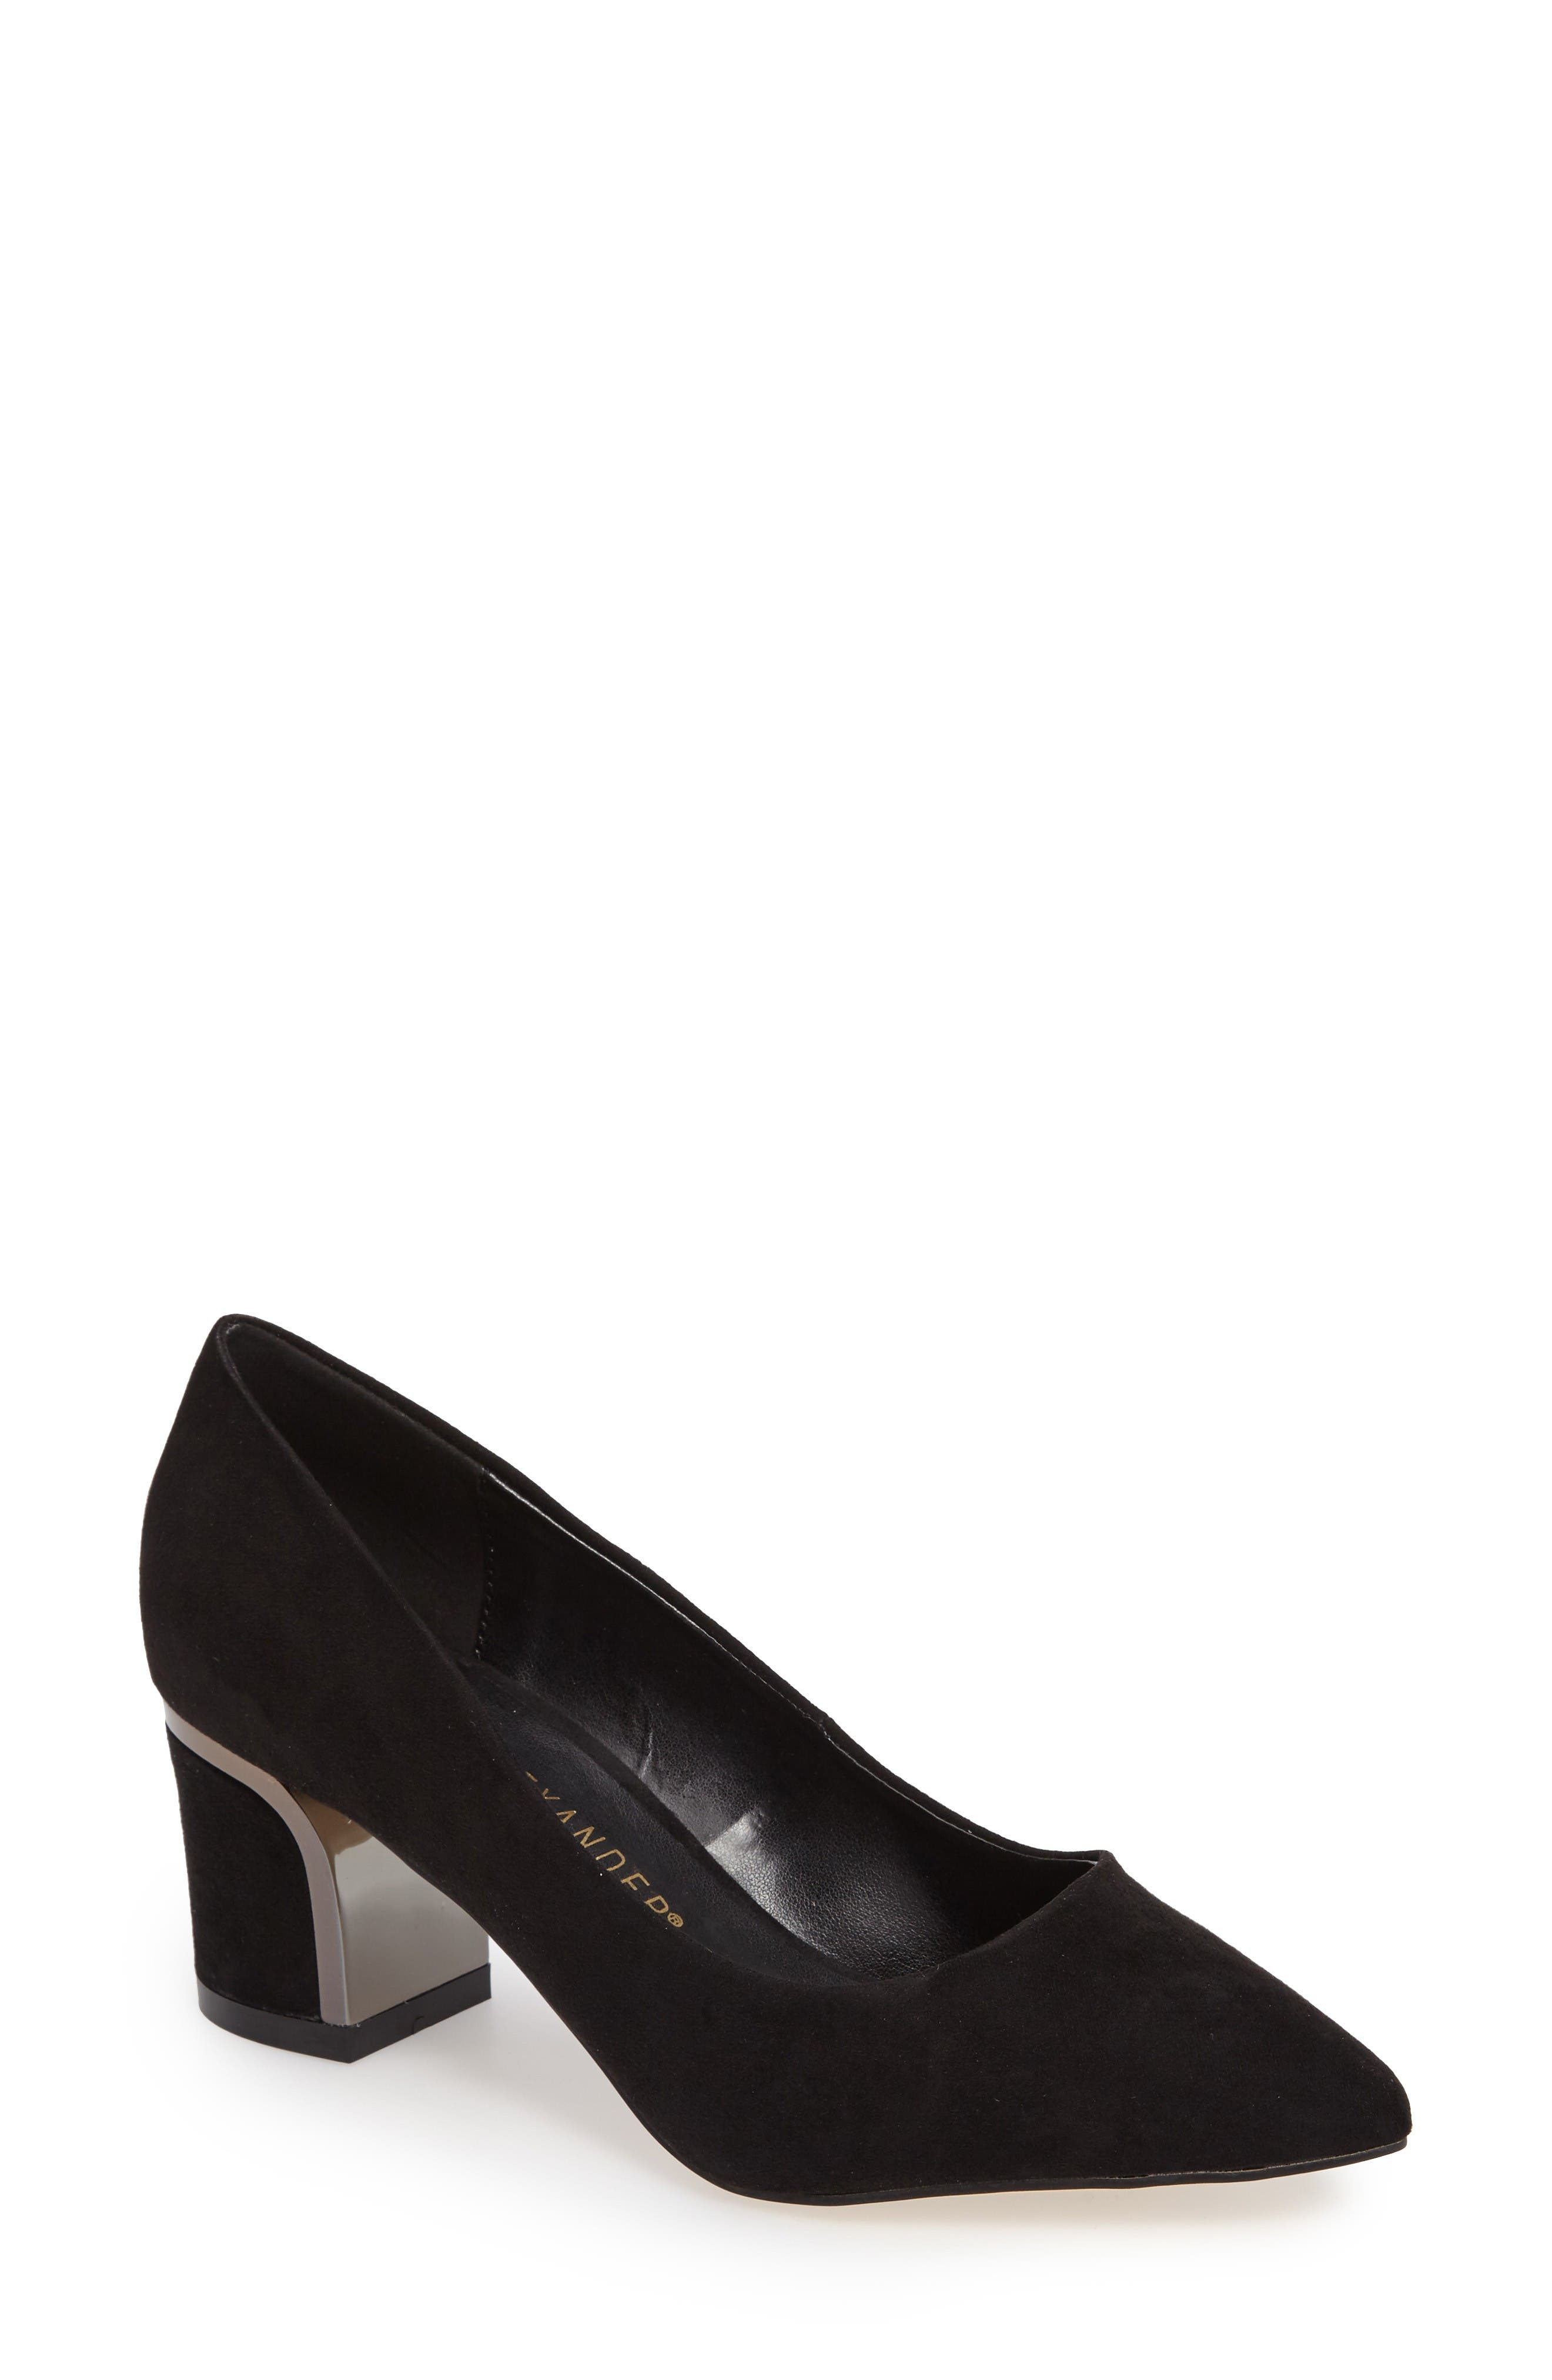 Zabel Embellished Block Heel Pump,                             Main thumbnail 1, color,                             Black Faux Suede